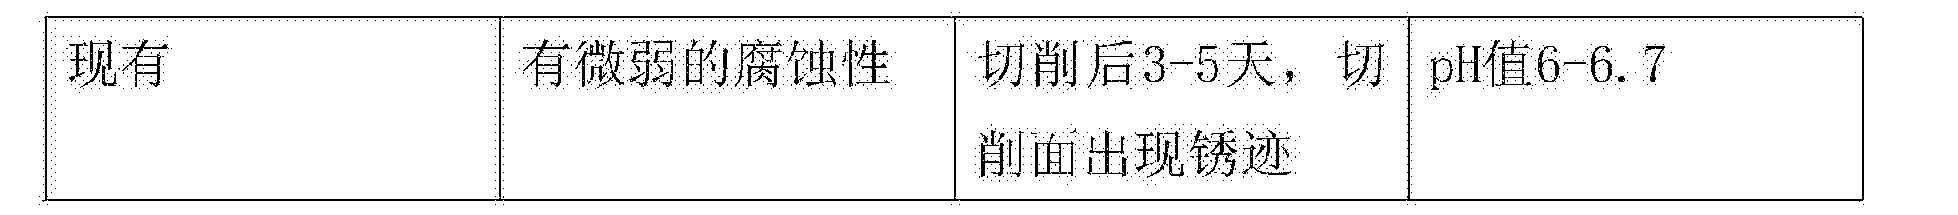 Figure CN107502903AD00052